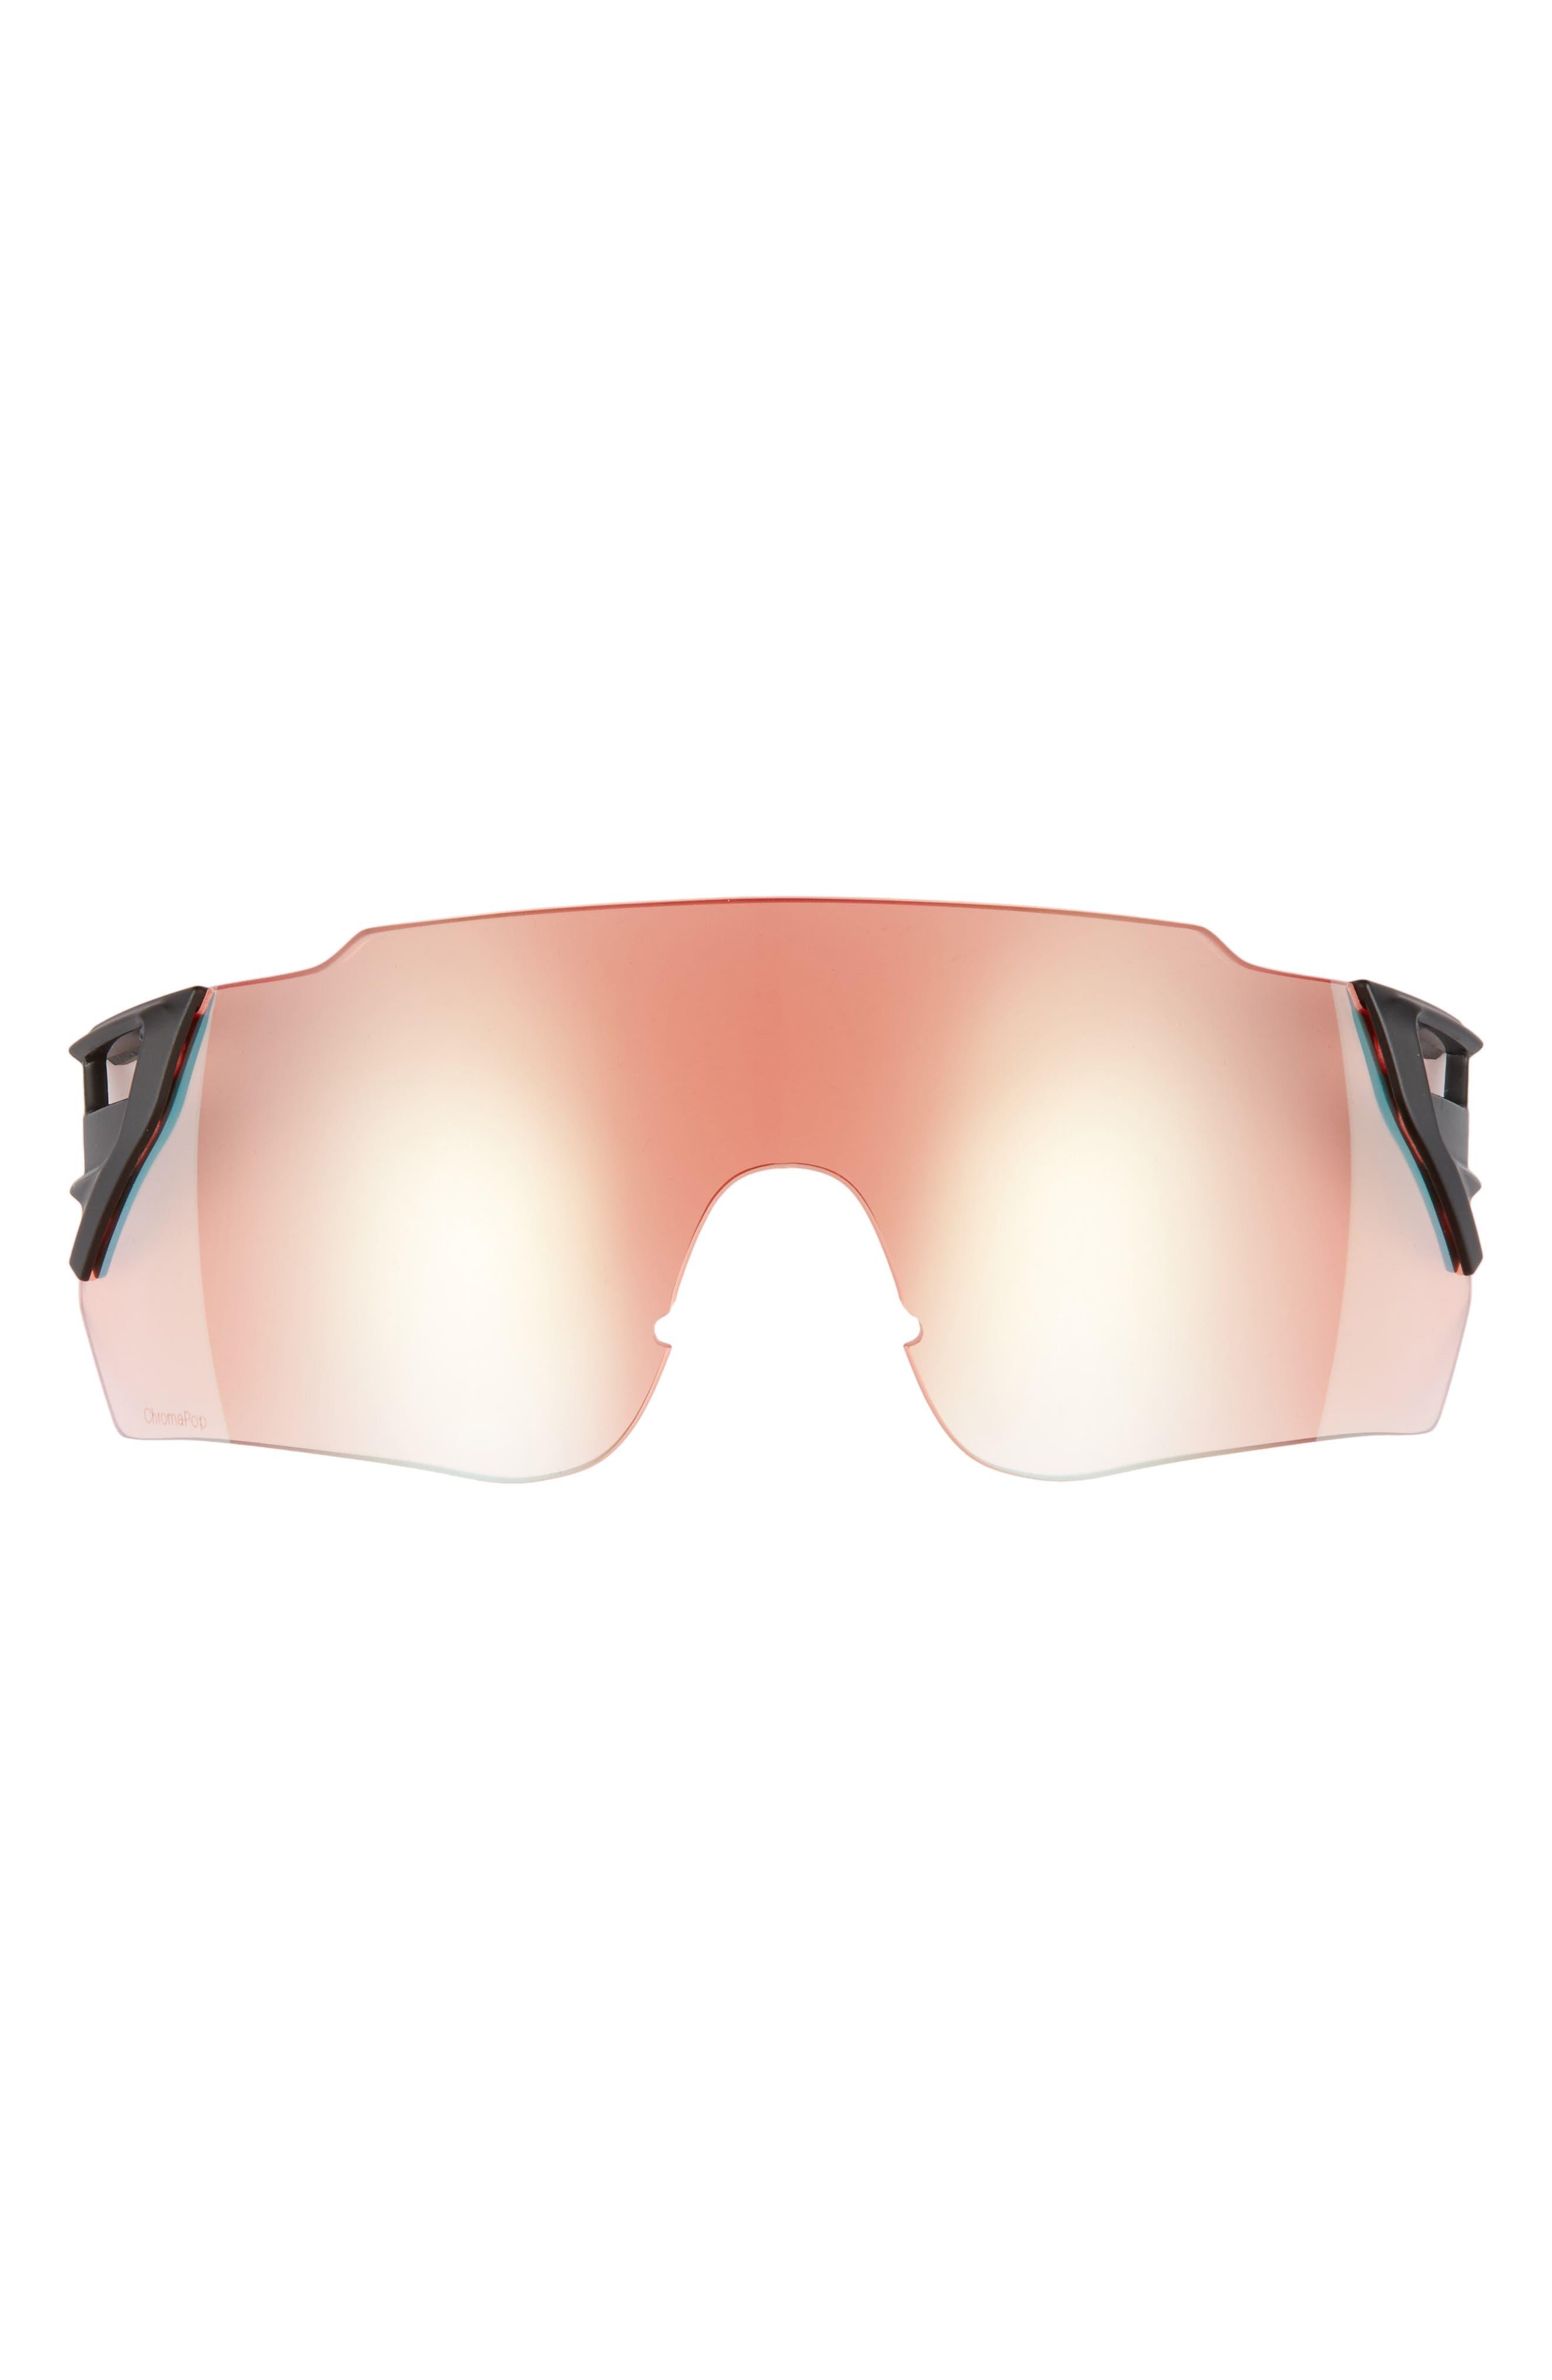 Attack Max 125mm ChromaPop<sup>™</sup> Polarized Shield Sunglasses,                             Alternate thumbnail 5, color,                             002